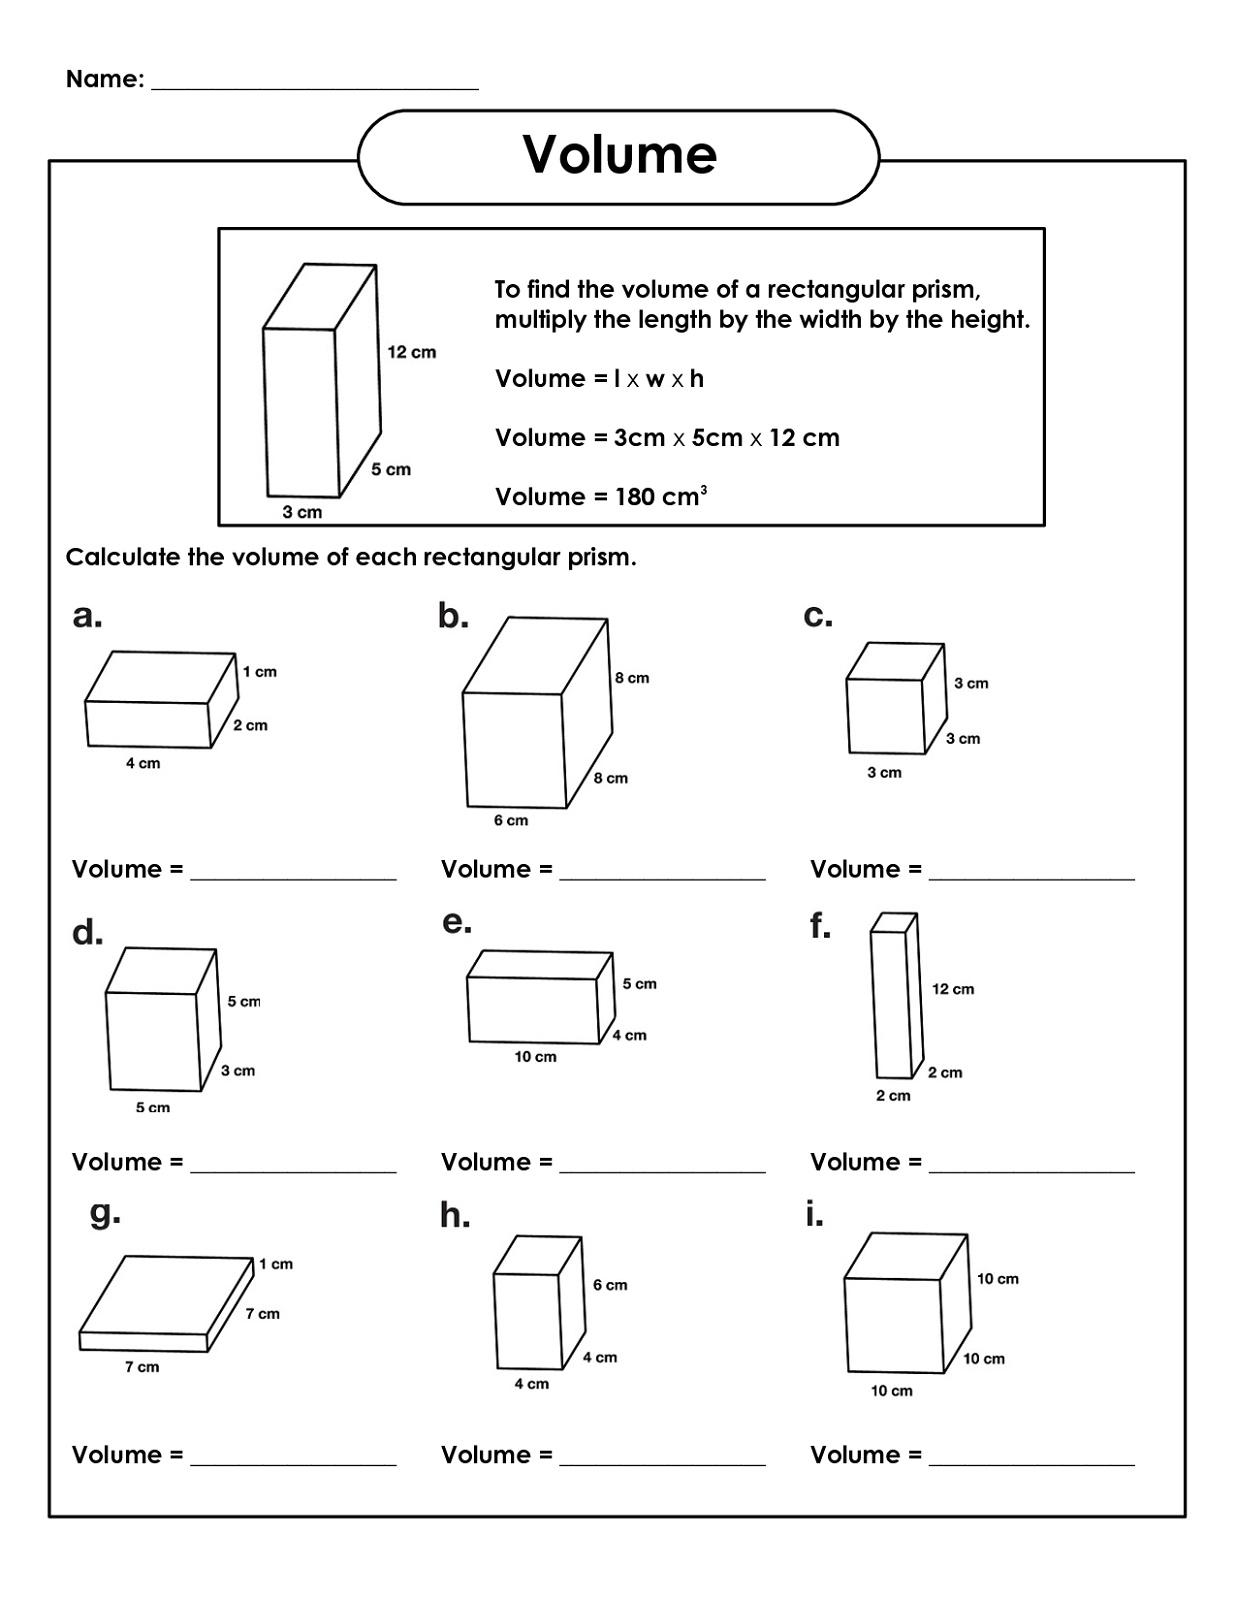 5th Grade Math Worksheets Volume